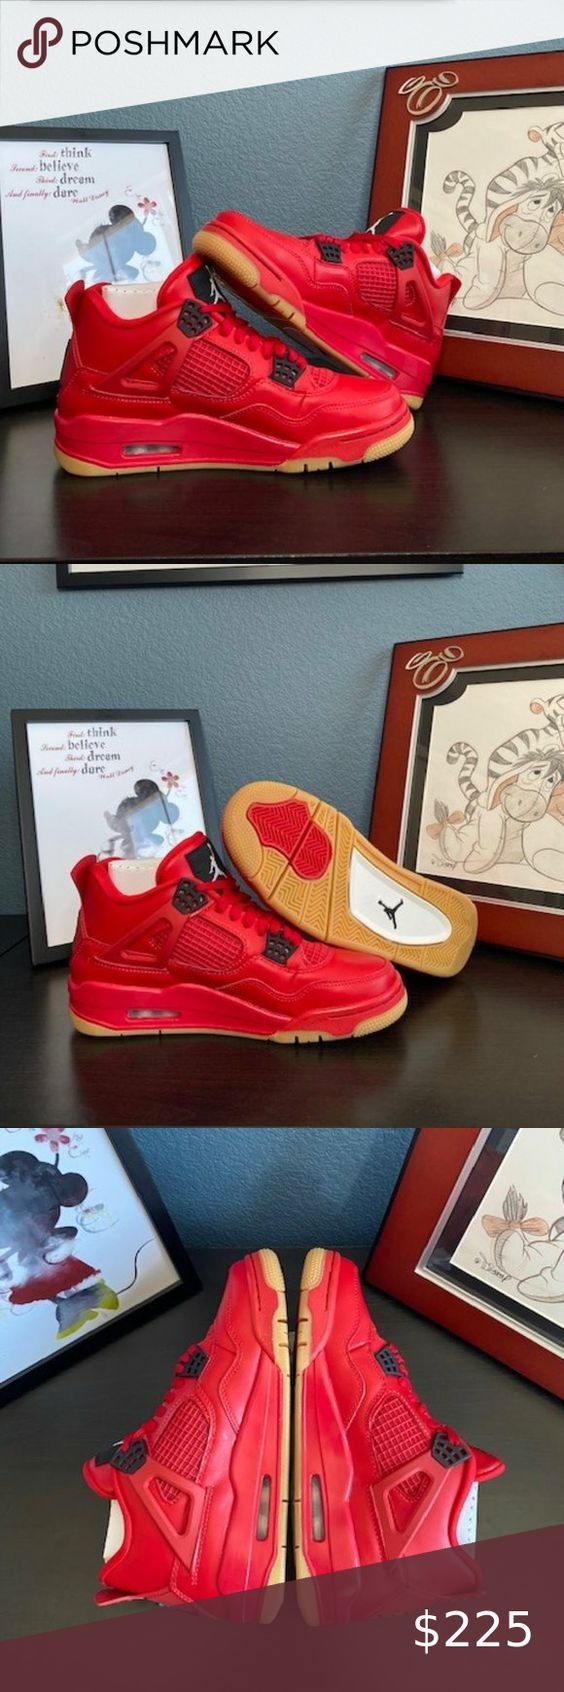 Wmns Air Jordan 4 Retro NRG 'Singles Day'